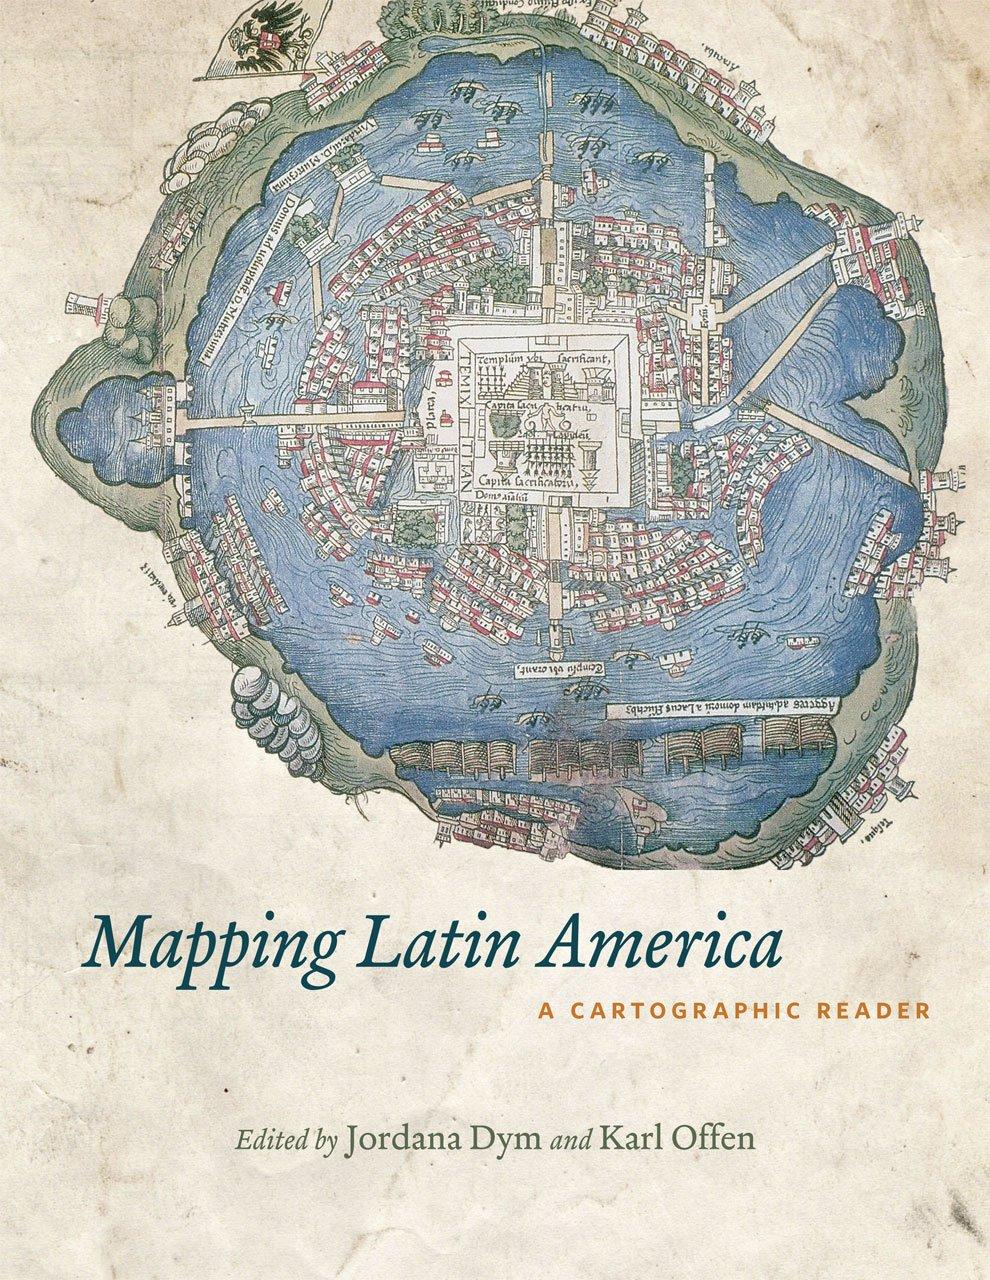 Amazon Com Mapping Latin America A Cartographic Reader 9780226618227 Dym Jordana Offen Karl Books